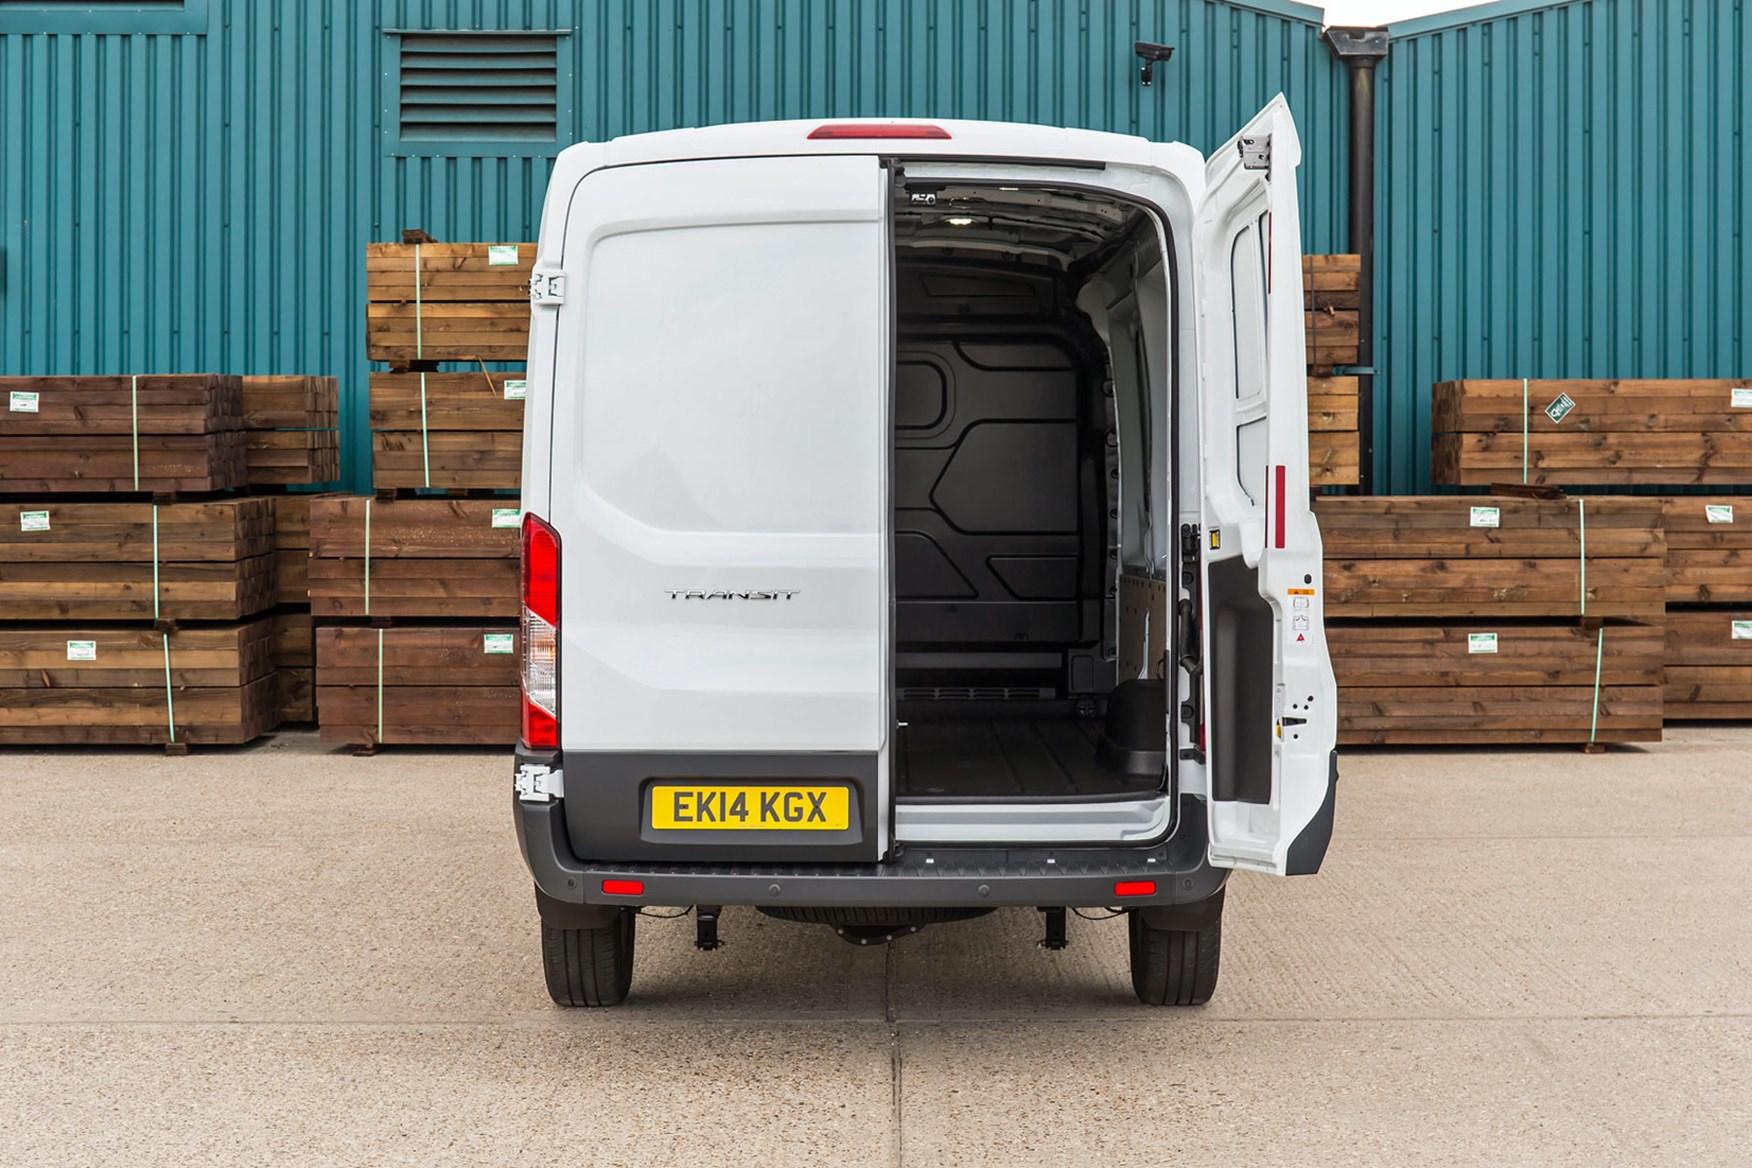 Ford Transit van dimensions, capacity, payload, volume ...